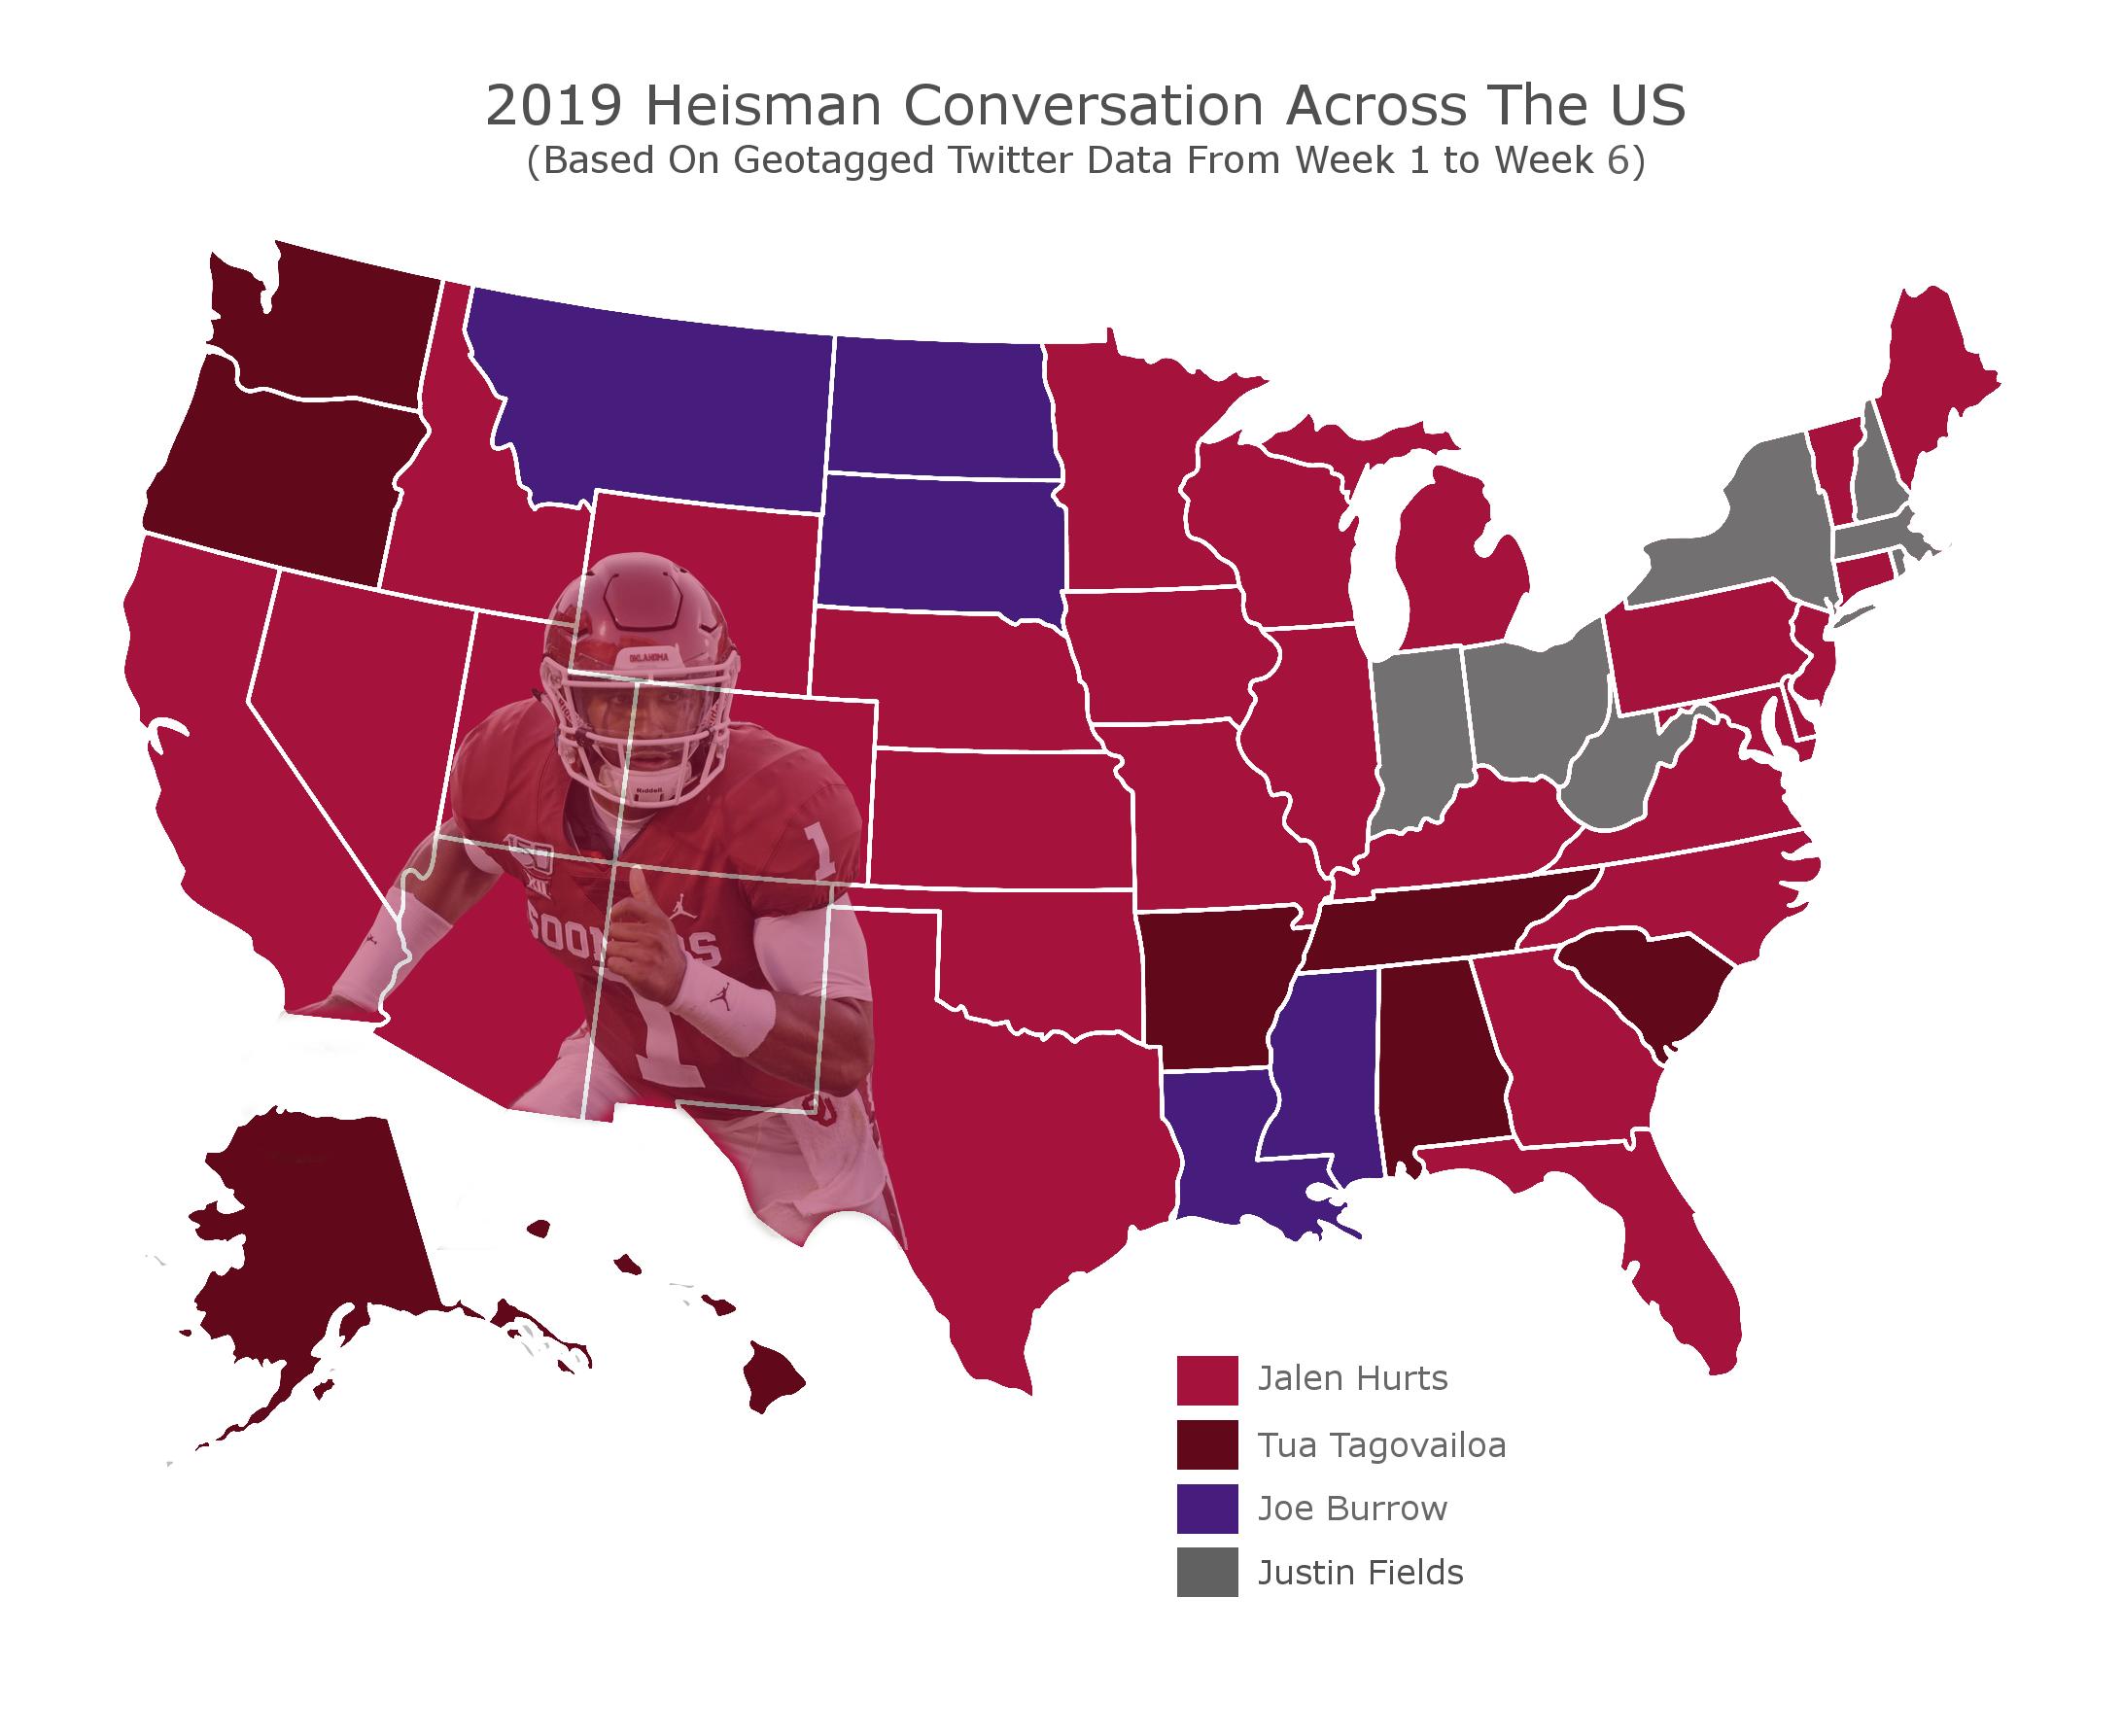 Heisman Map (Credit: bettingapps.org)